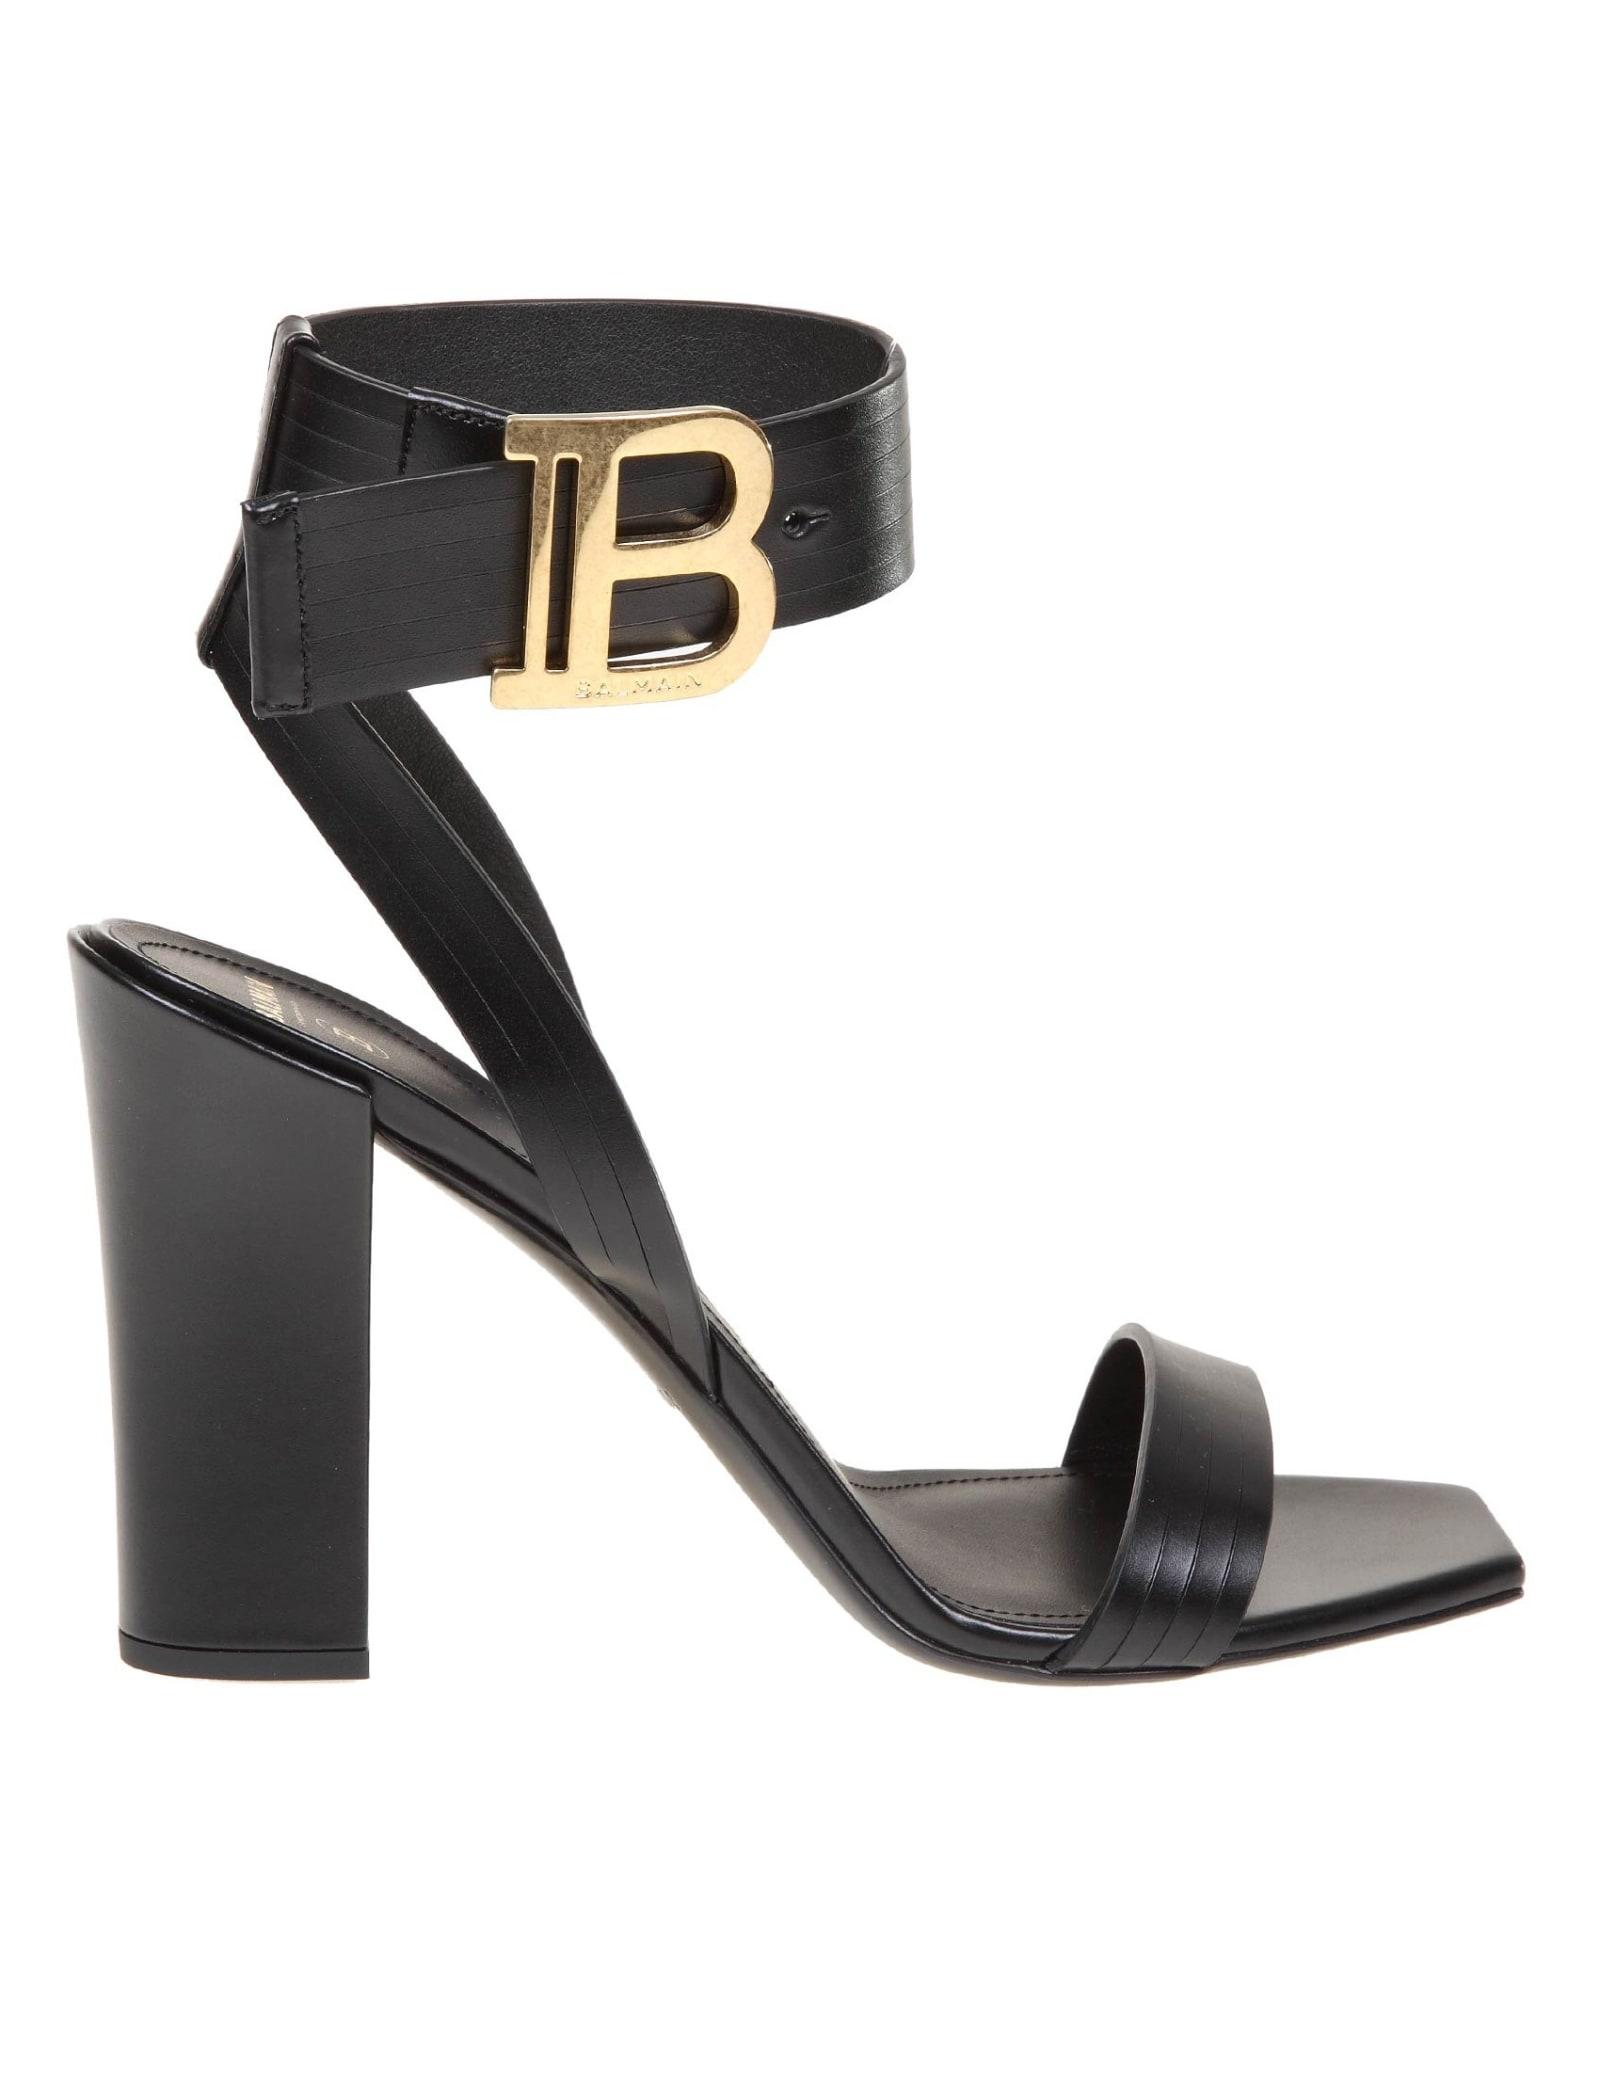 Balmain High heels STAR SANDAL IN BLACK LEATHER